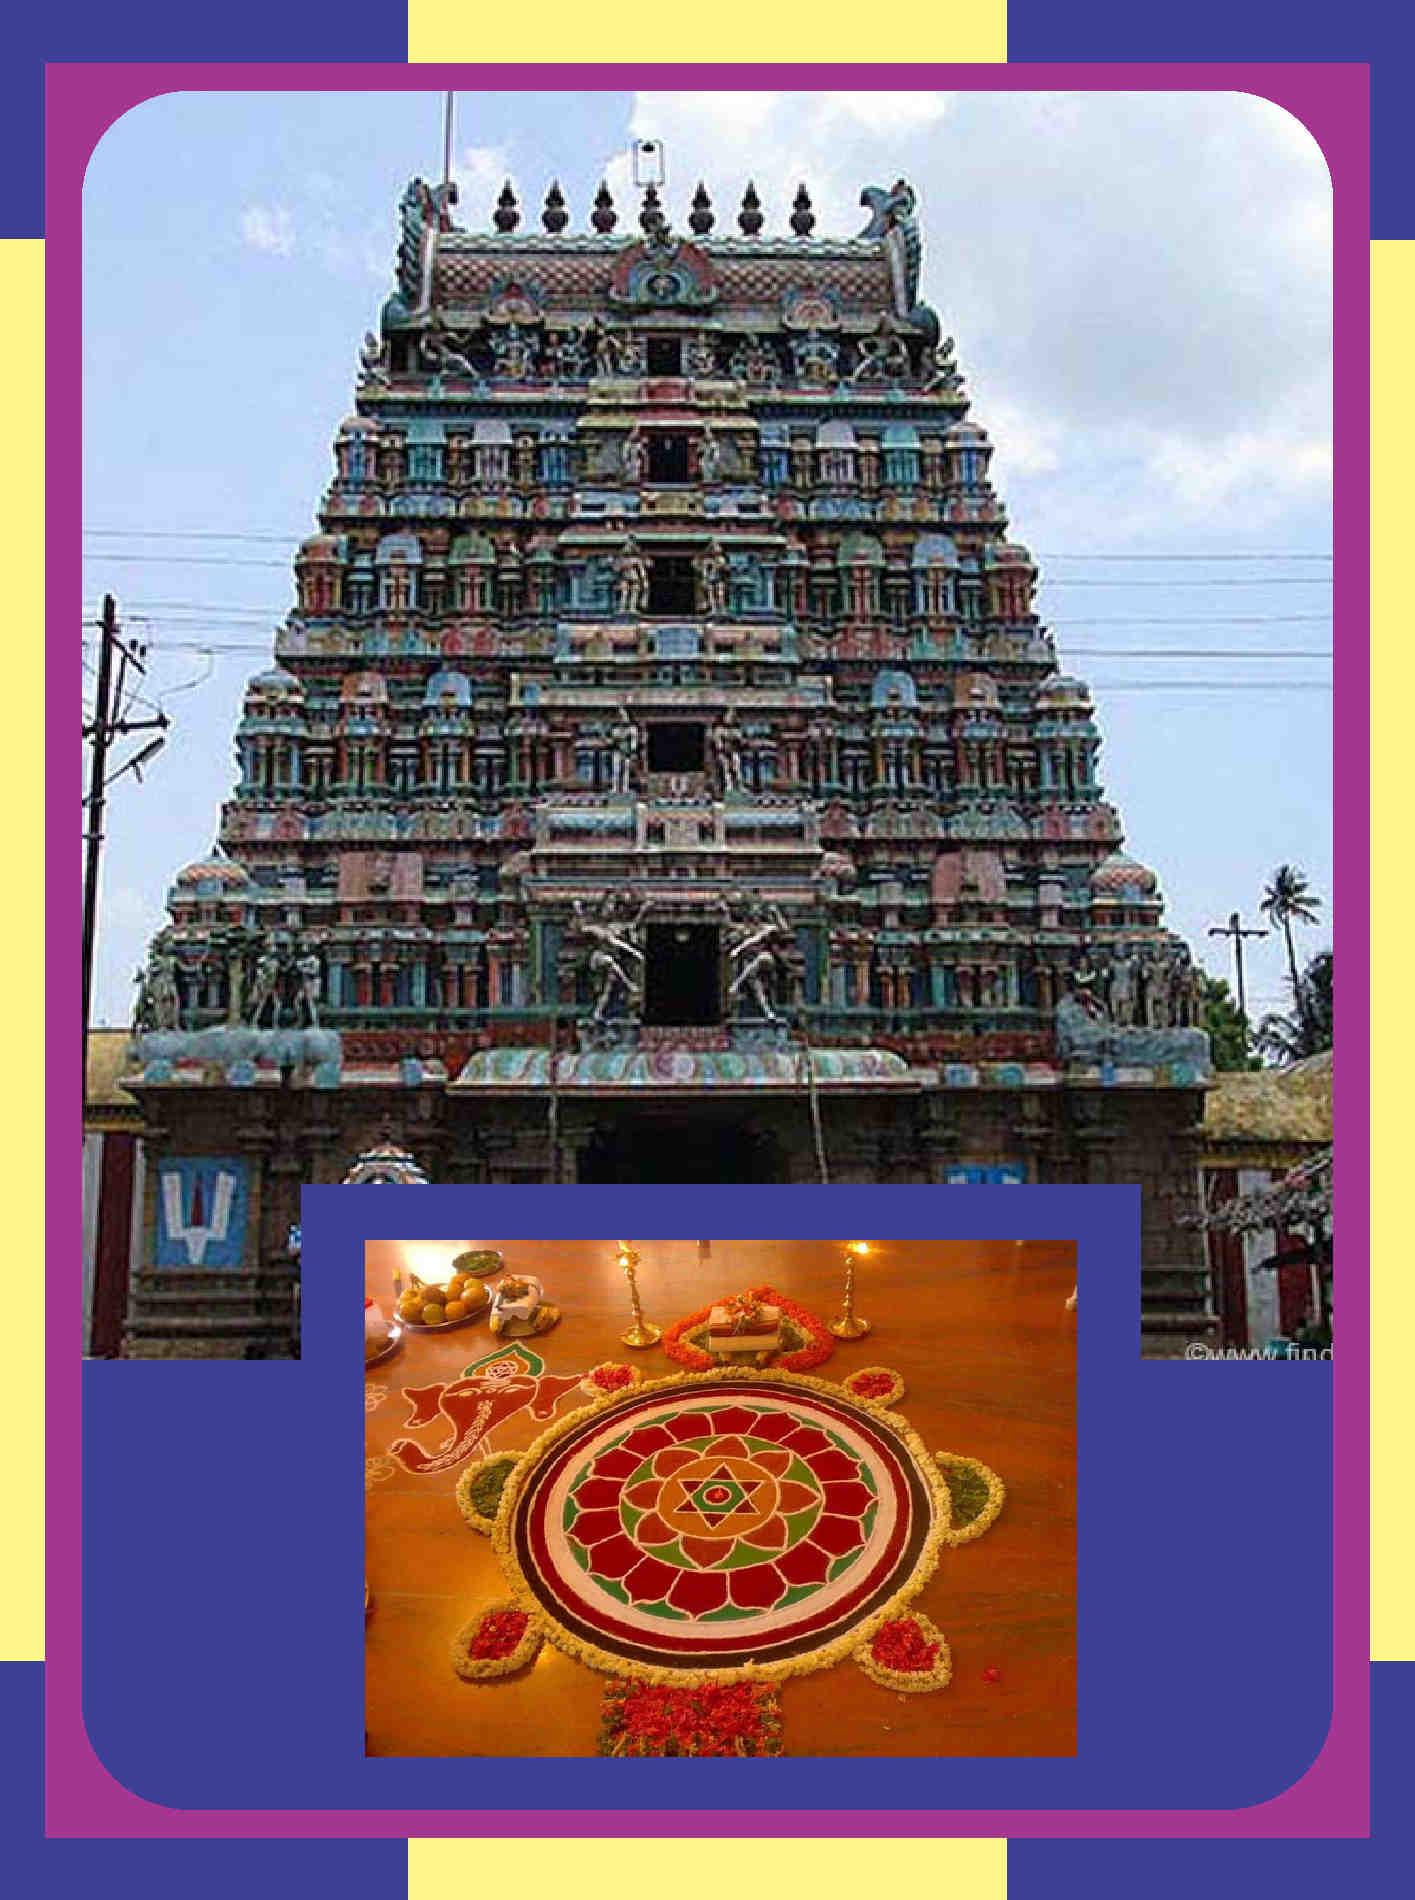 Nachiyar Koil - Sri Srinivasa Perumal Temple Spl Puja for Marriage Dhosam